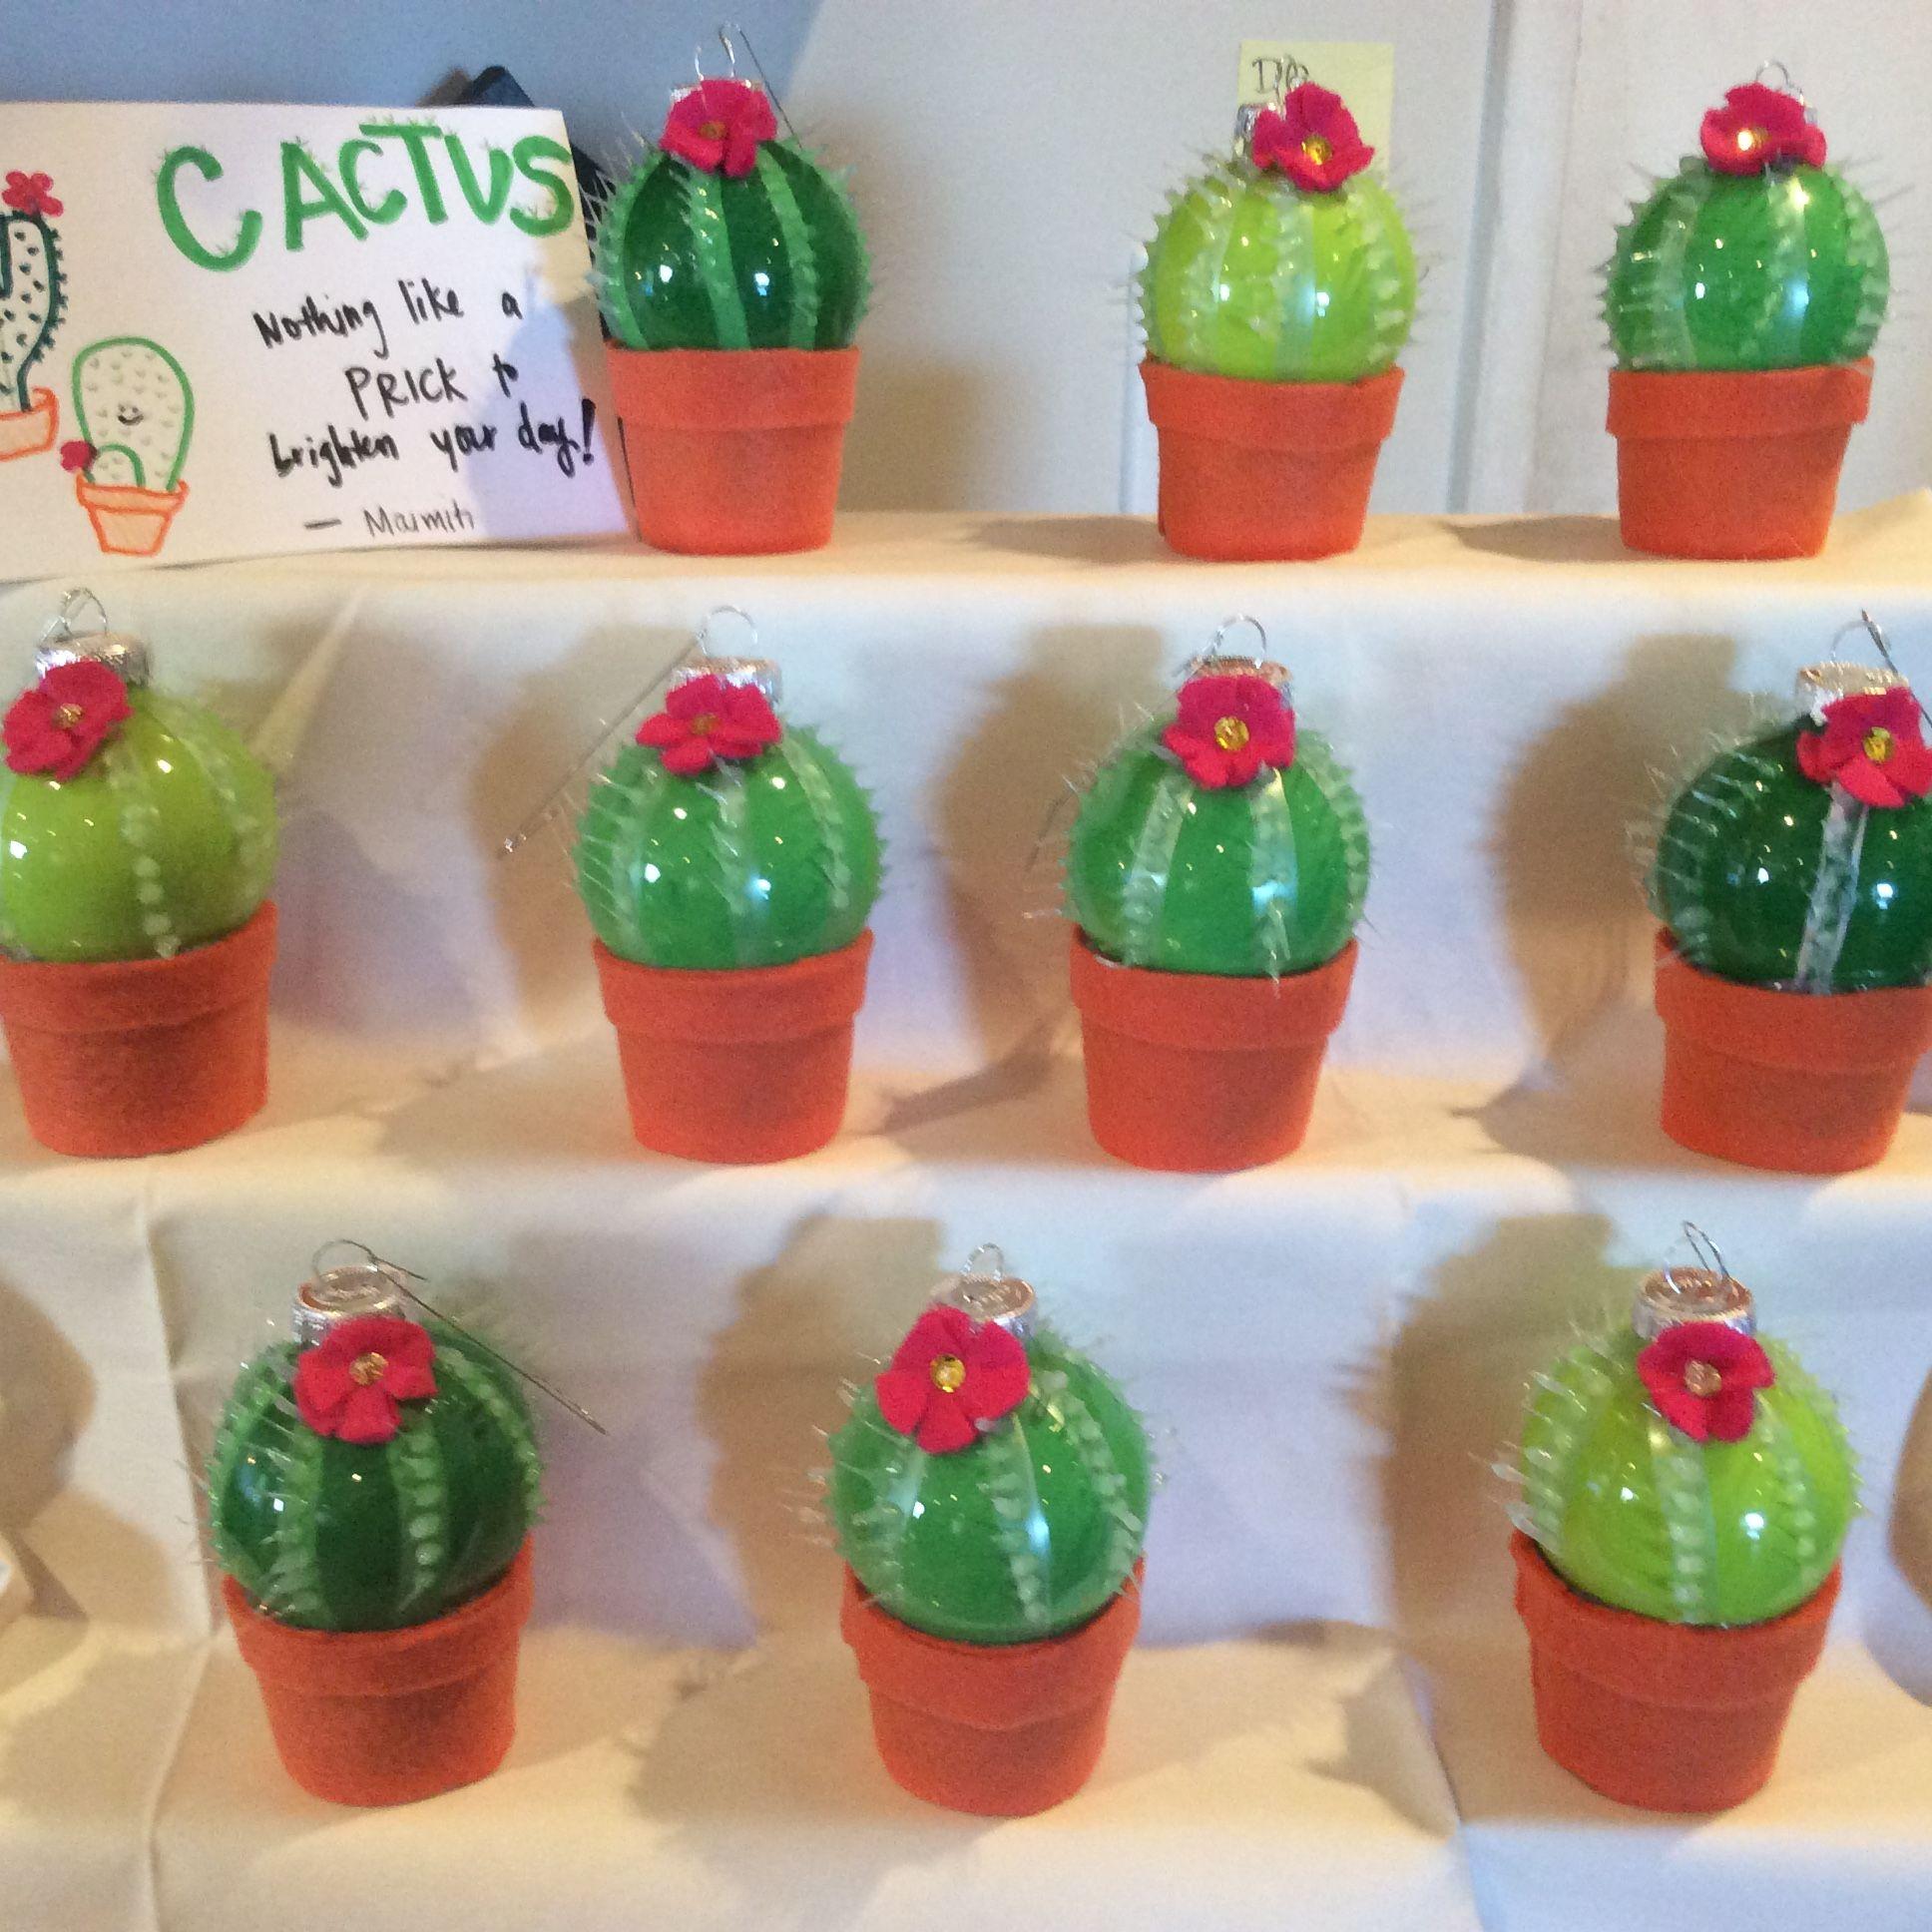 Nice christmas ornaments - Nice Display Of Cactus Ornaments